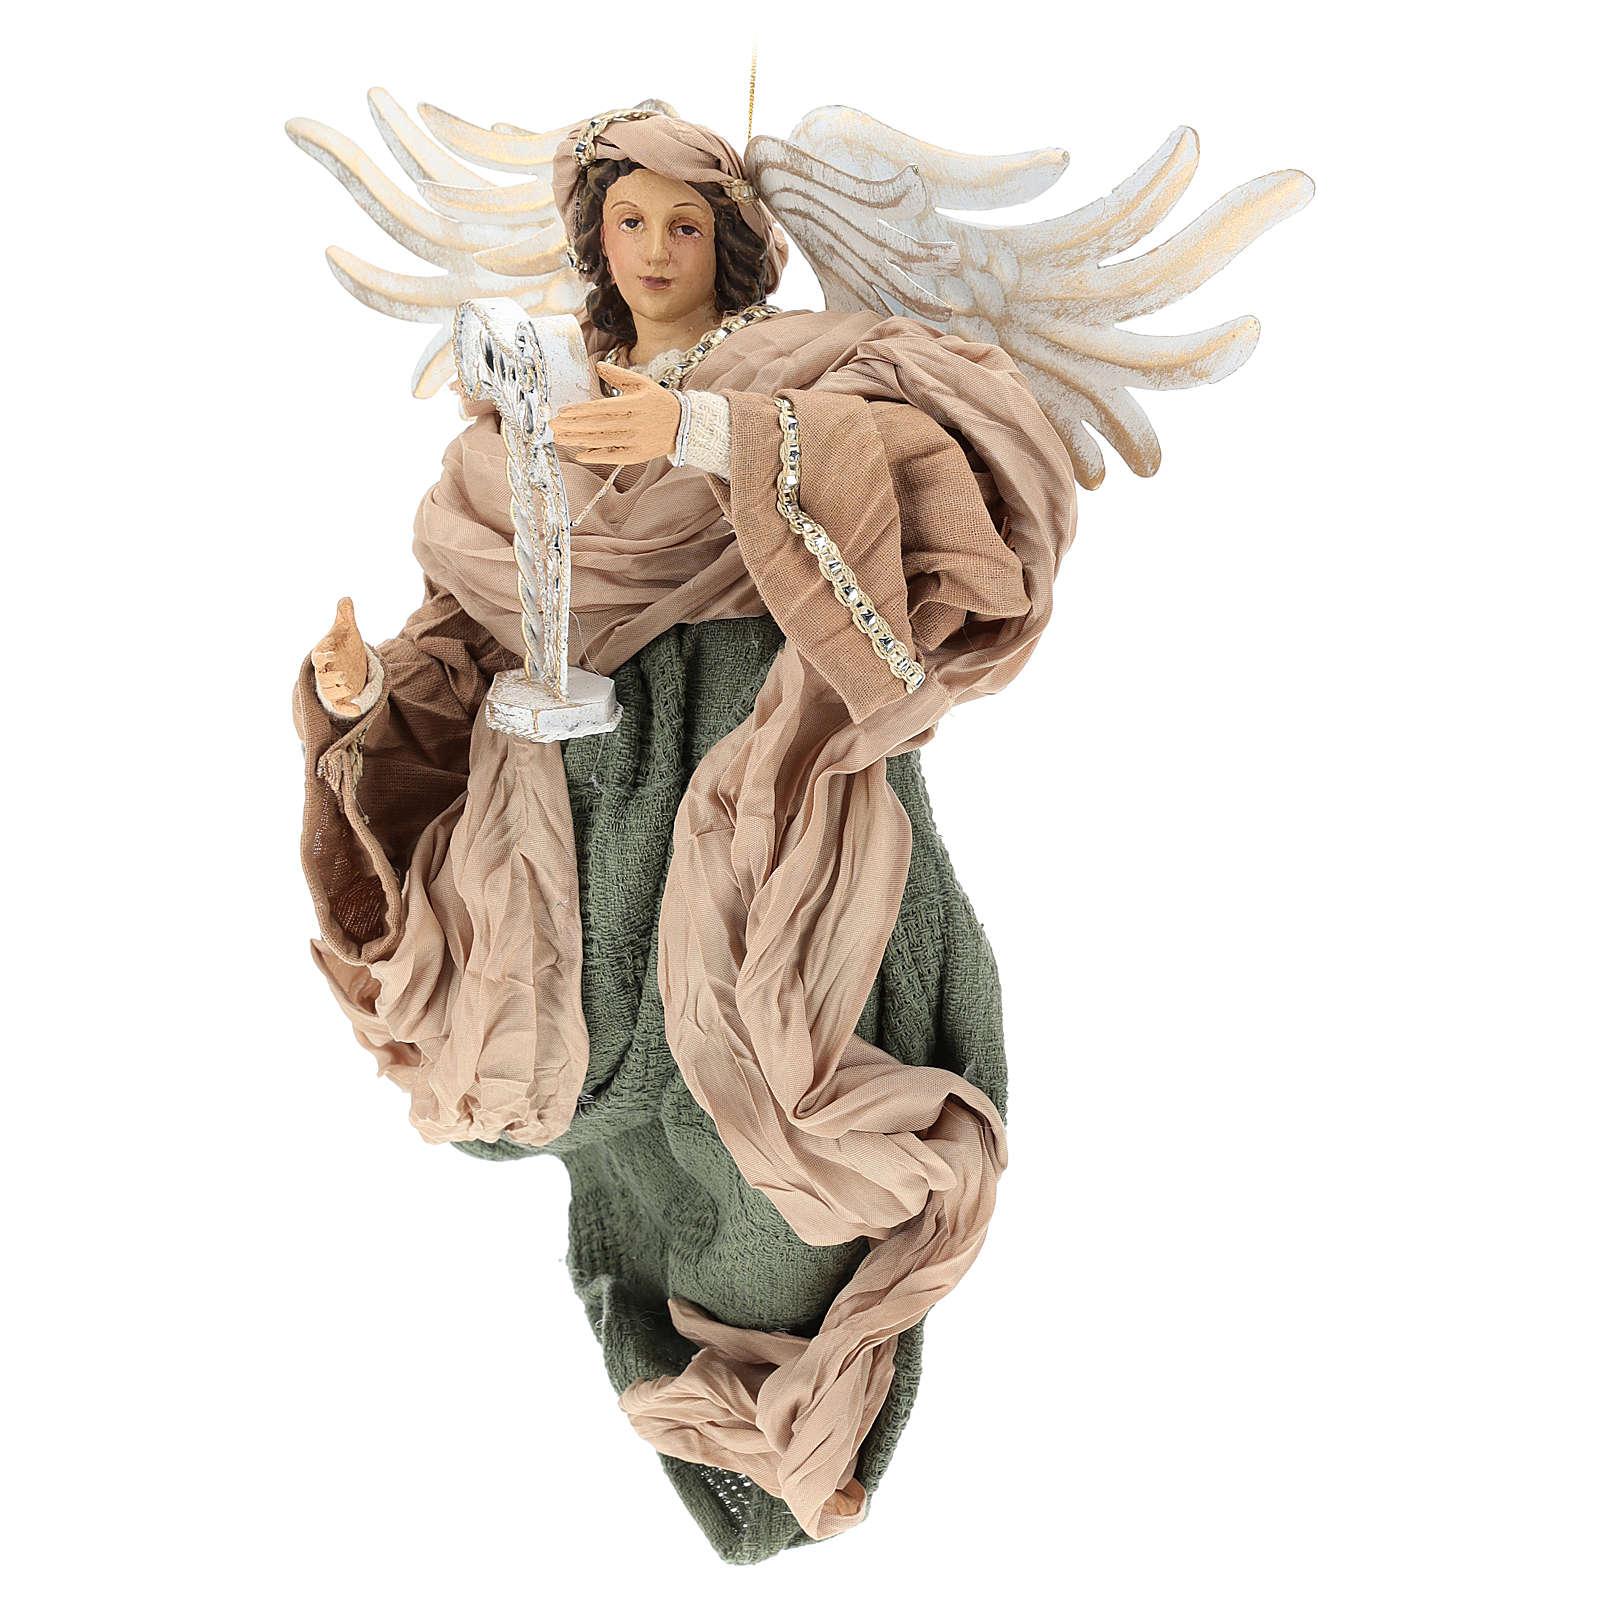 Angelo in volo 35 cm in resina dettagli in tessuto 3